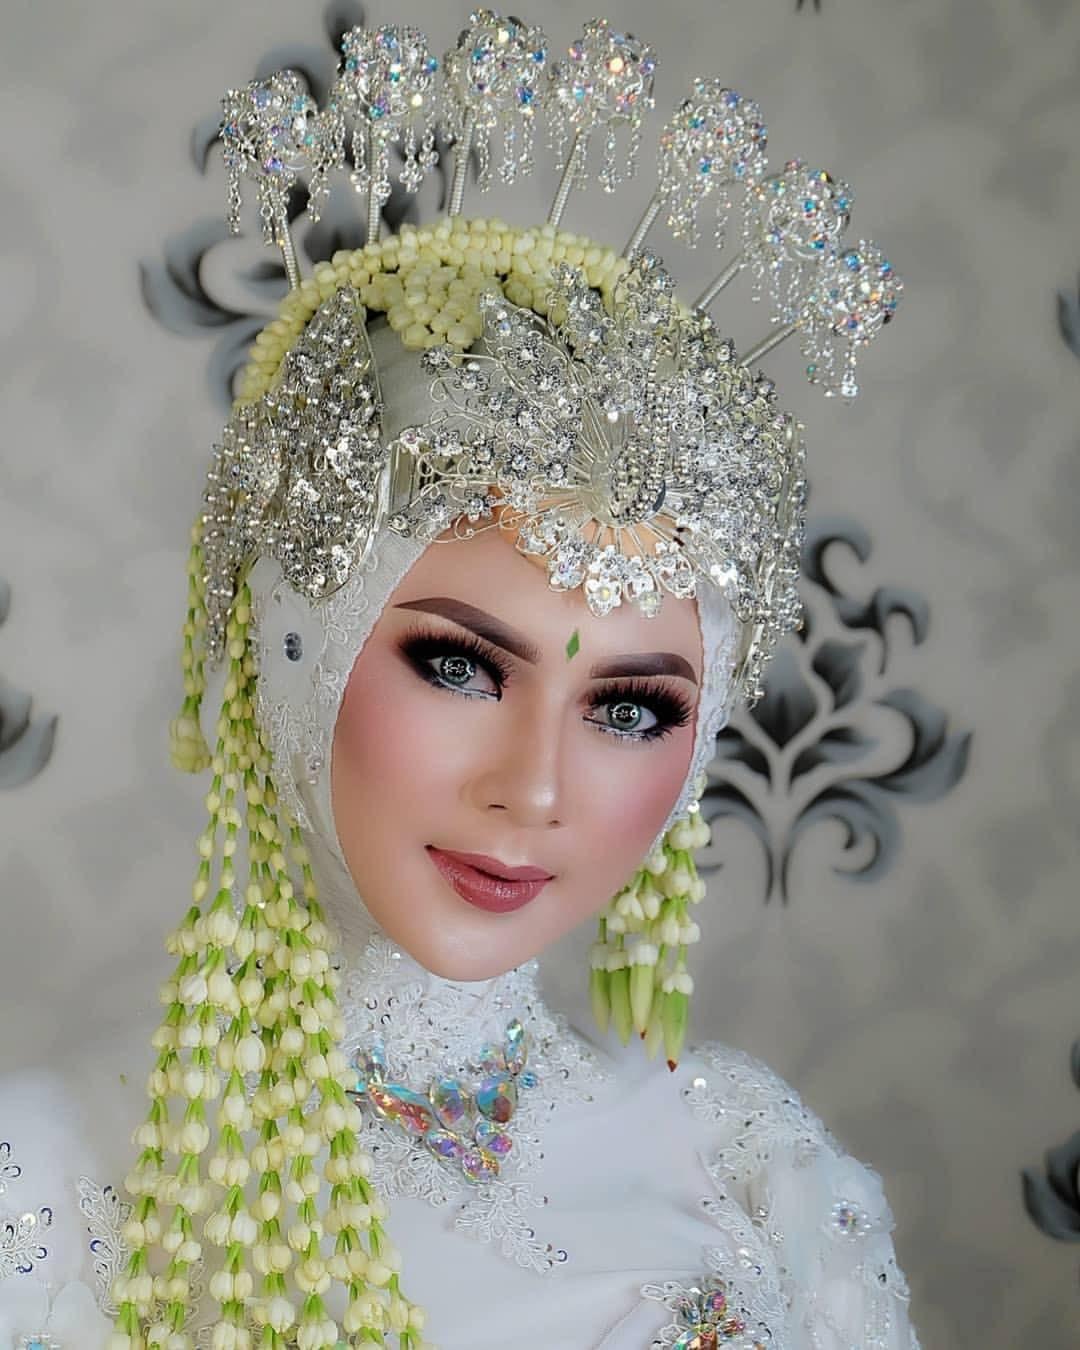 Vvip Clas Make Up Nbsp Nbsp Aini Nbsp Nbsp Wedding Sunda Siger Merak Mini Silver Cocok Untuk Kebaya Putih Ataupun Kebaya Make Up Pengantin Muslim Glamour